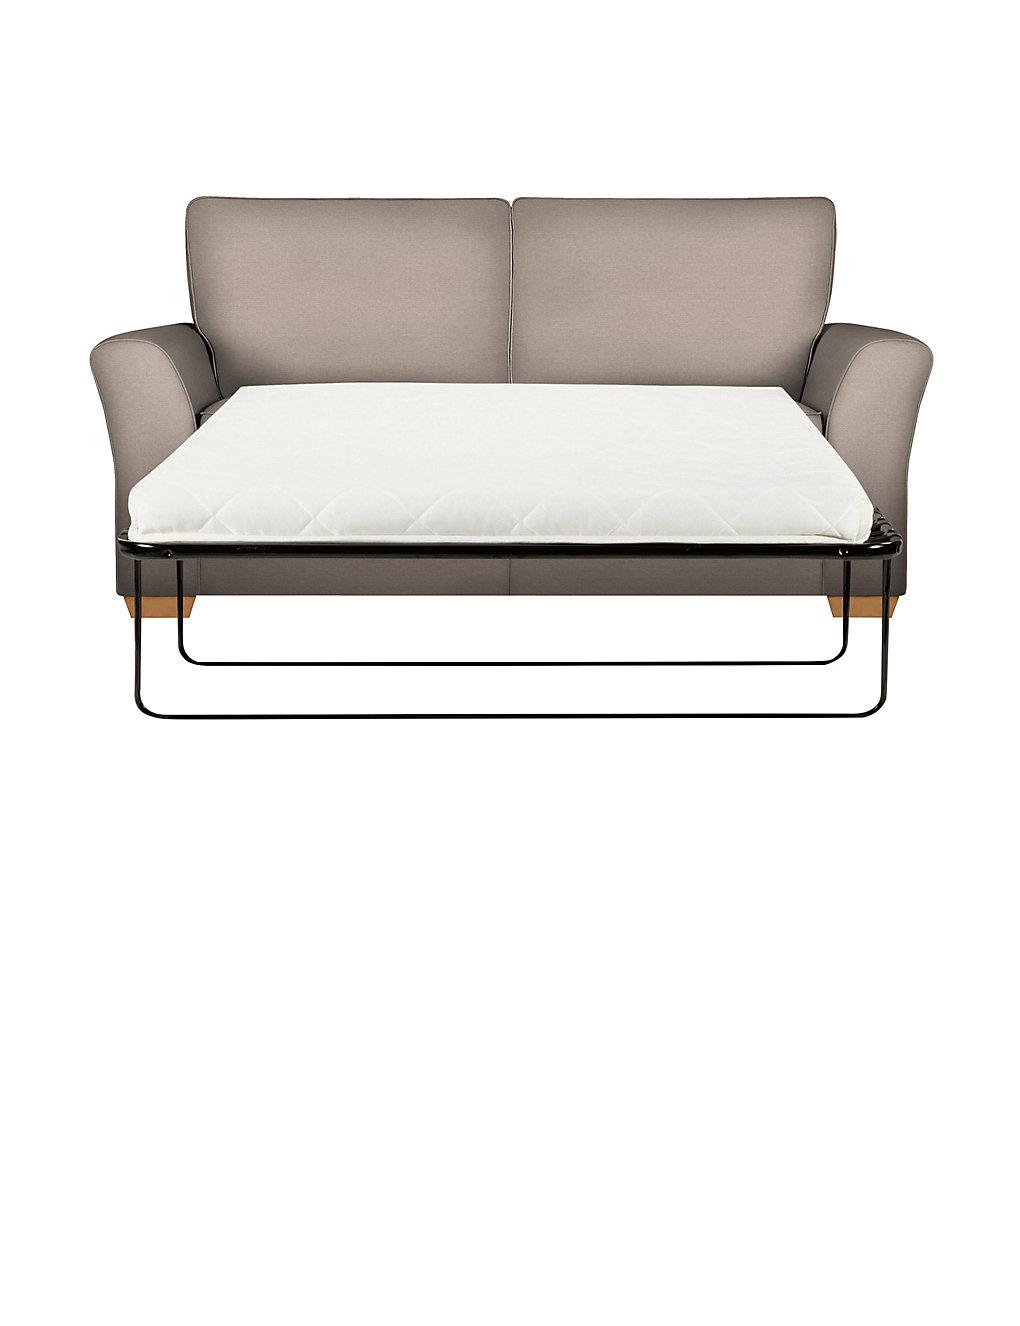 Large Sofa Bed Nantucket Large Sofa Bed Sprung M S Thesofa